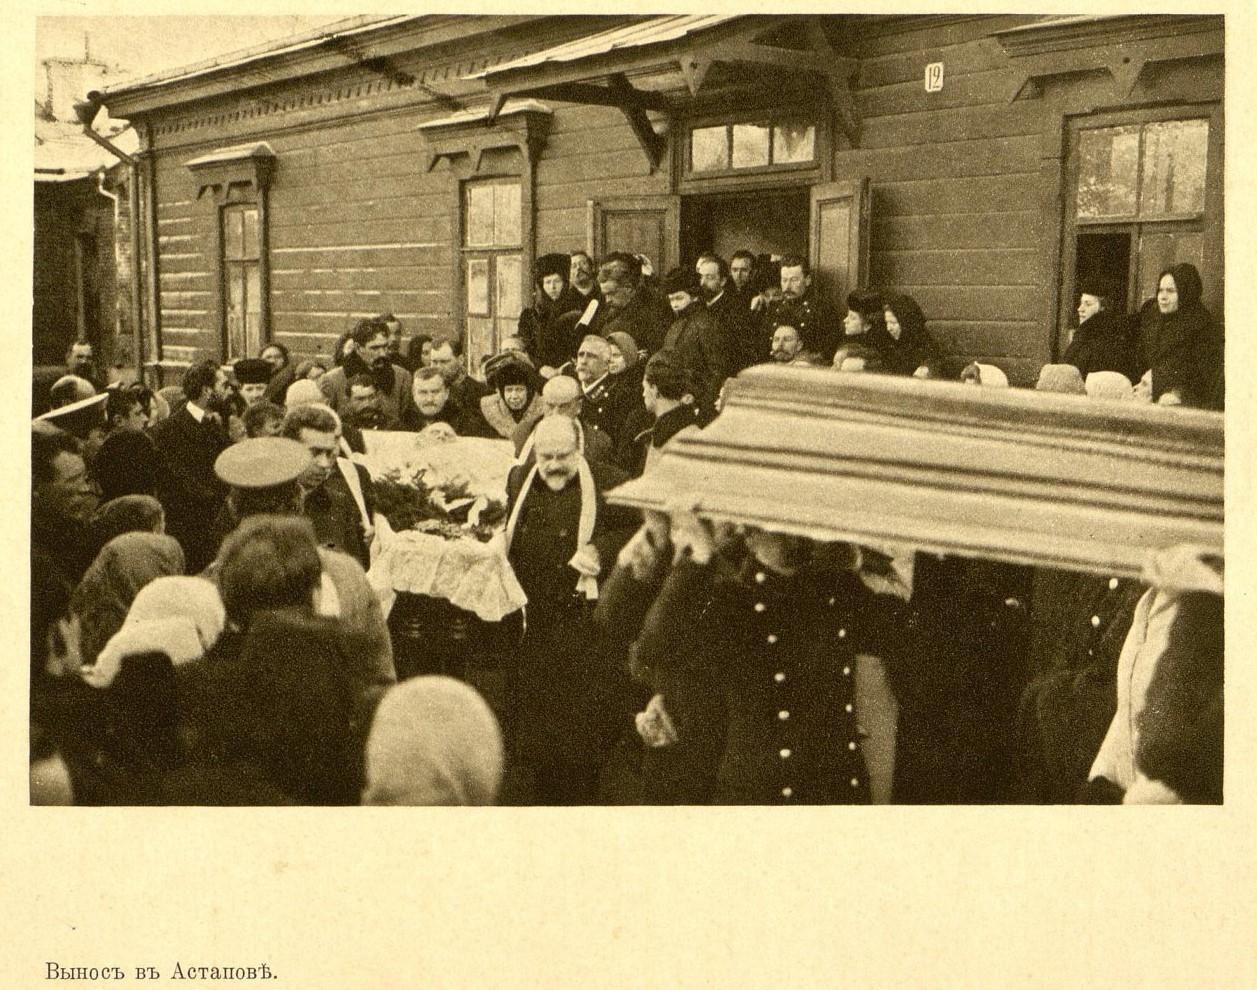 Transfert du corps de Tolstoï depuis Astapovo, en 1910